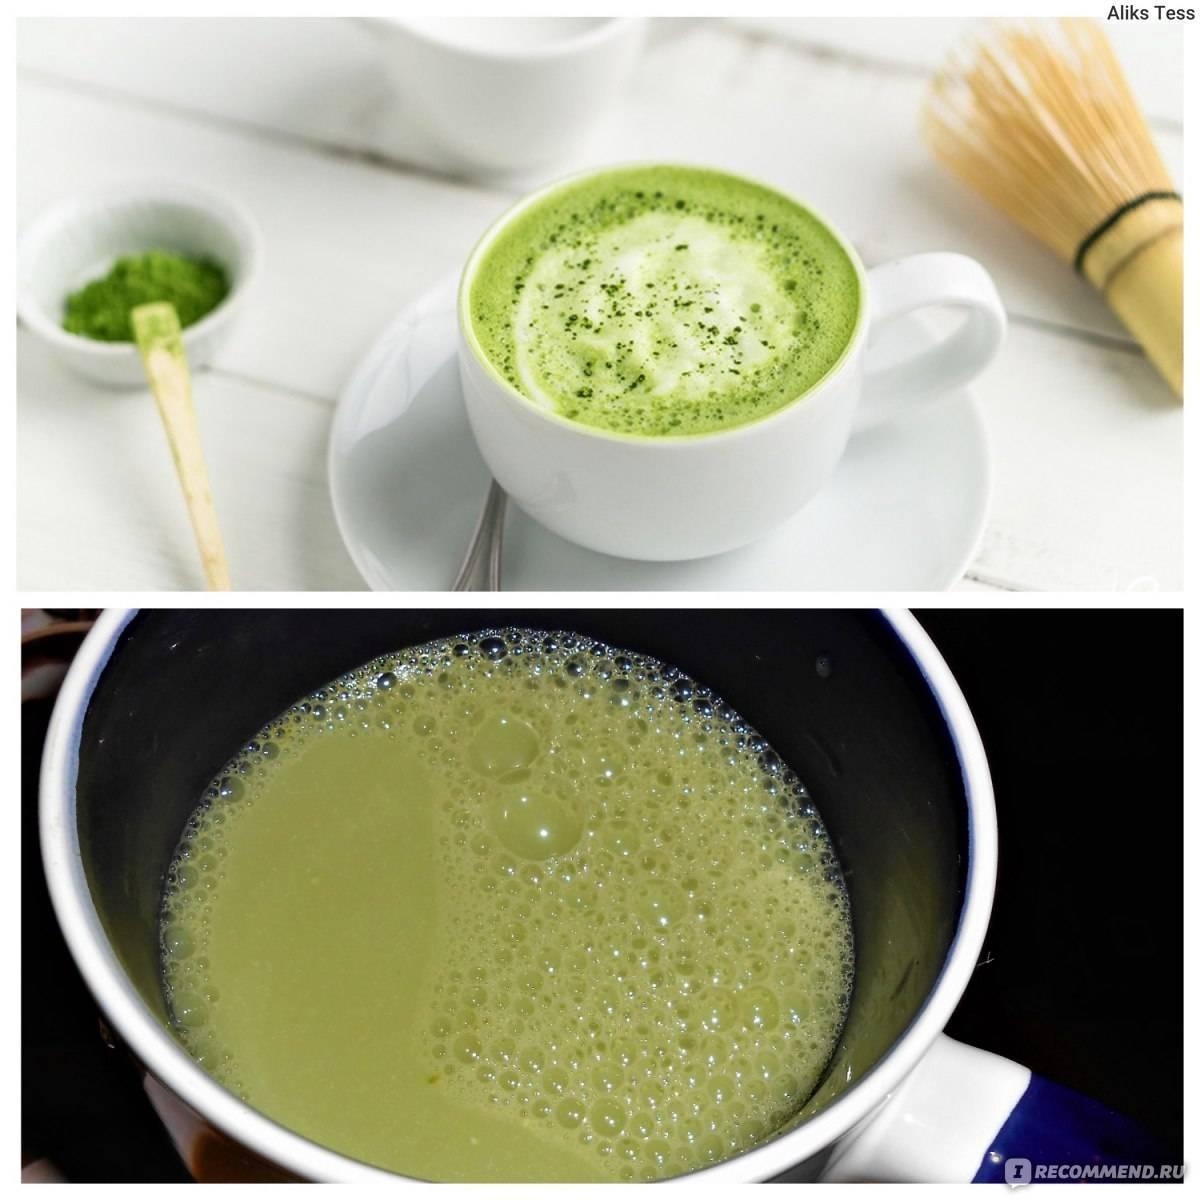 Матча – легендарный зелёный чай